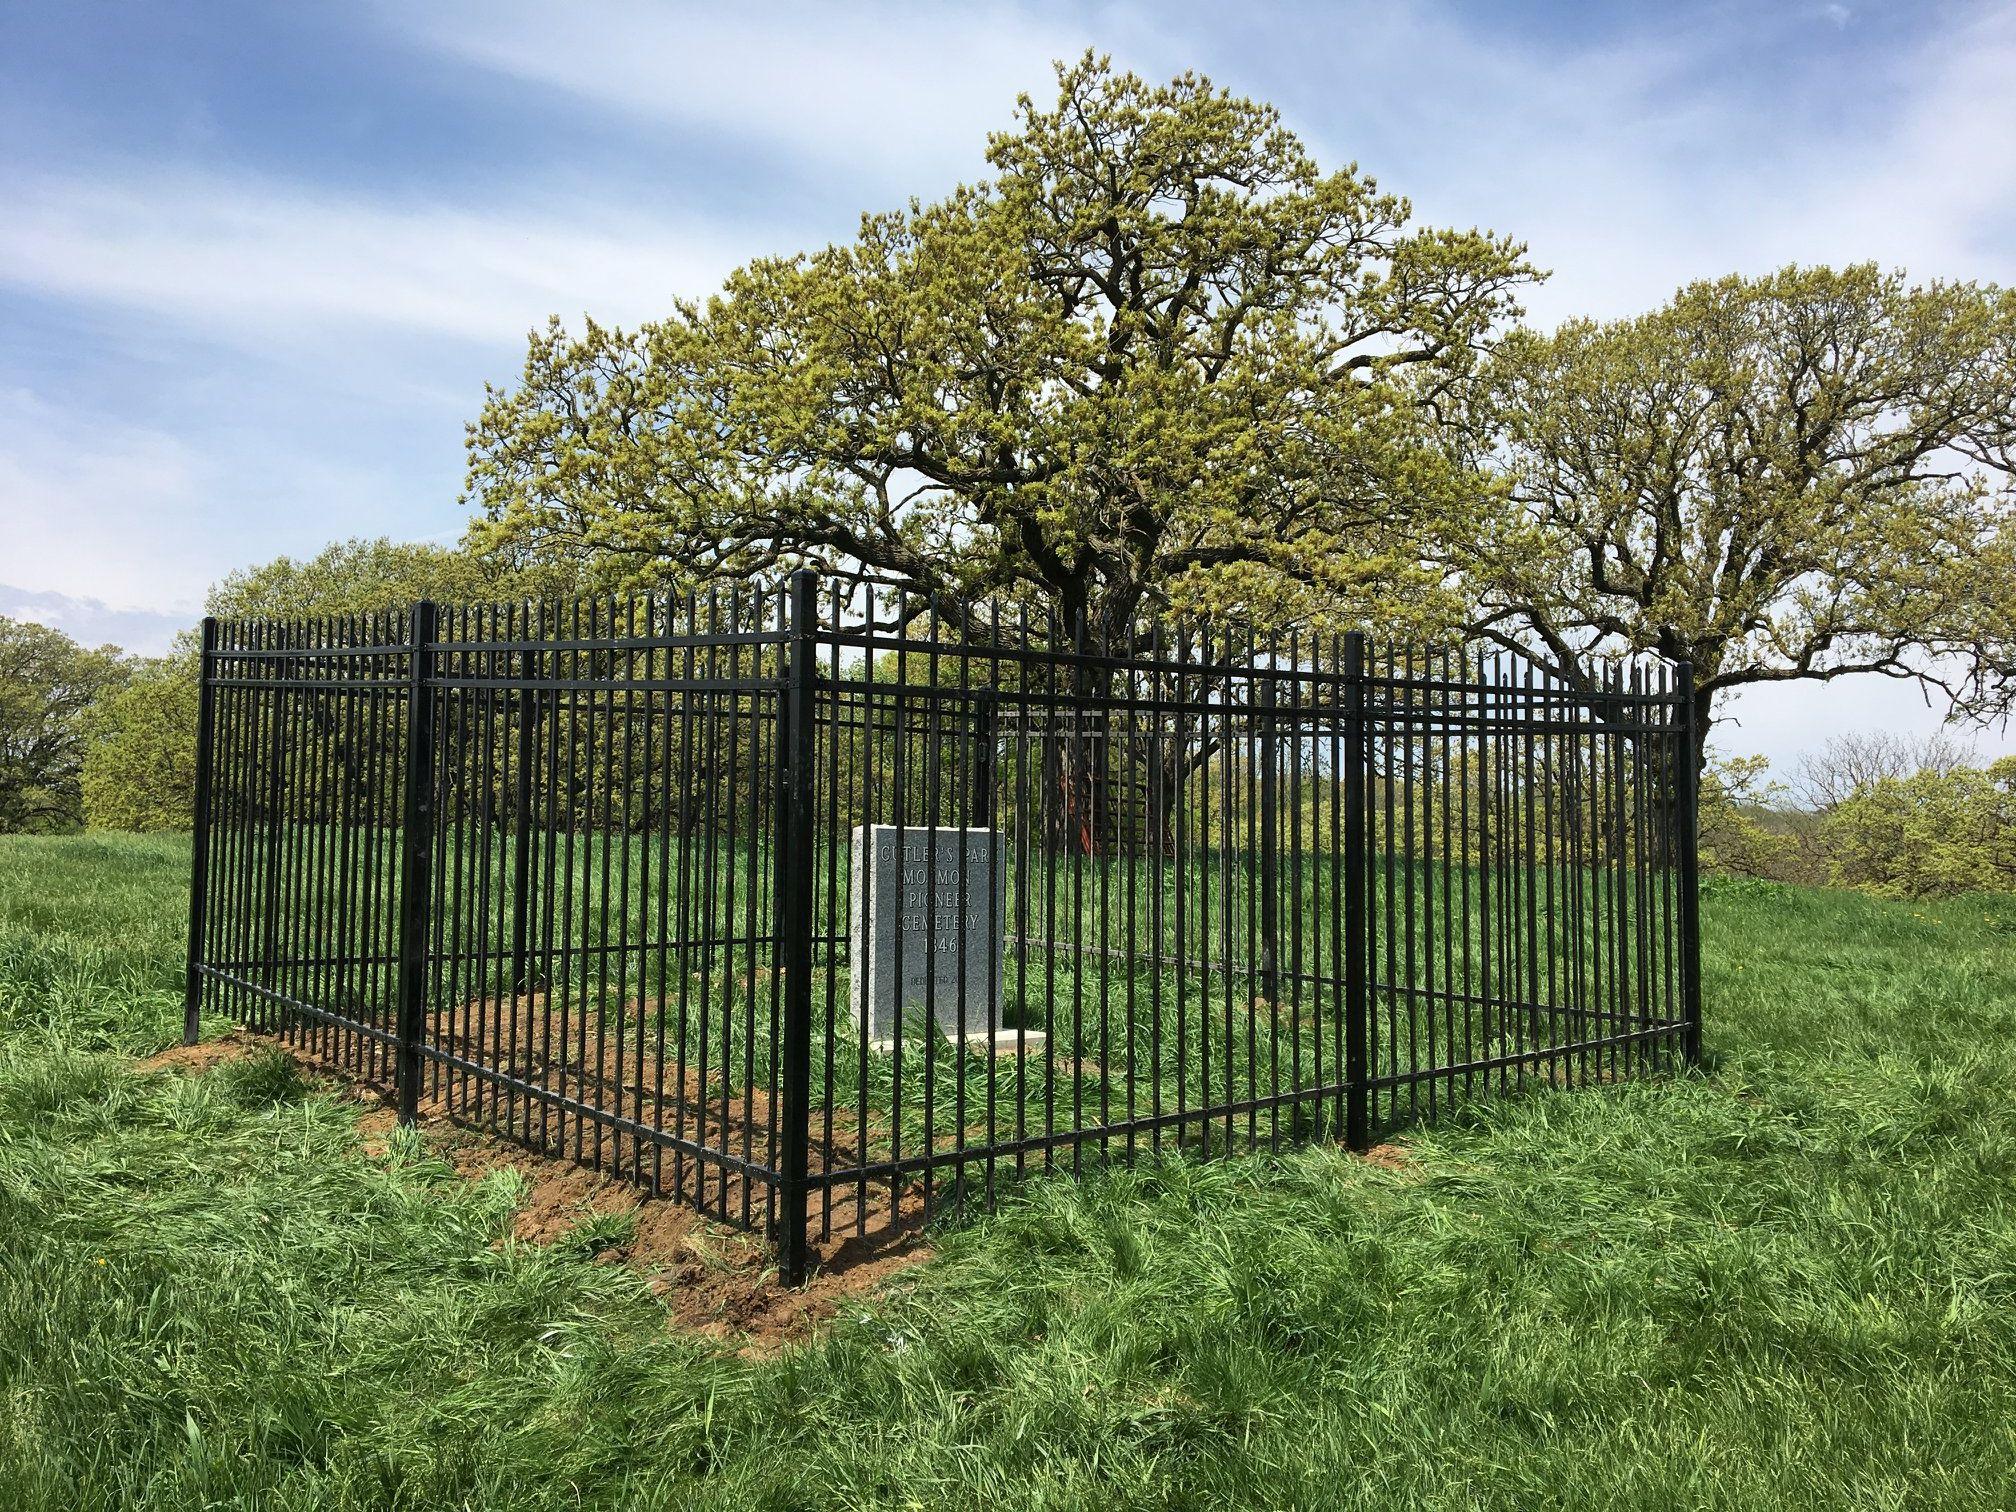 Cutler's Park Cemetery, Mormon Bridge Road, North Omaha, Nebraska